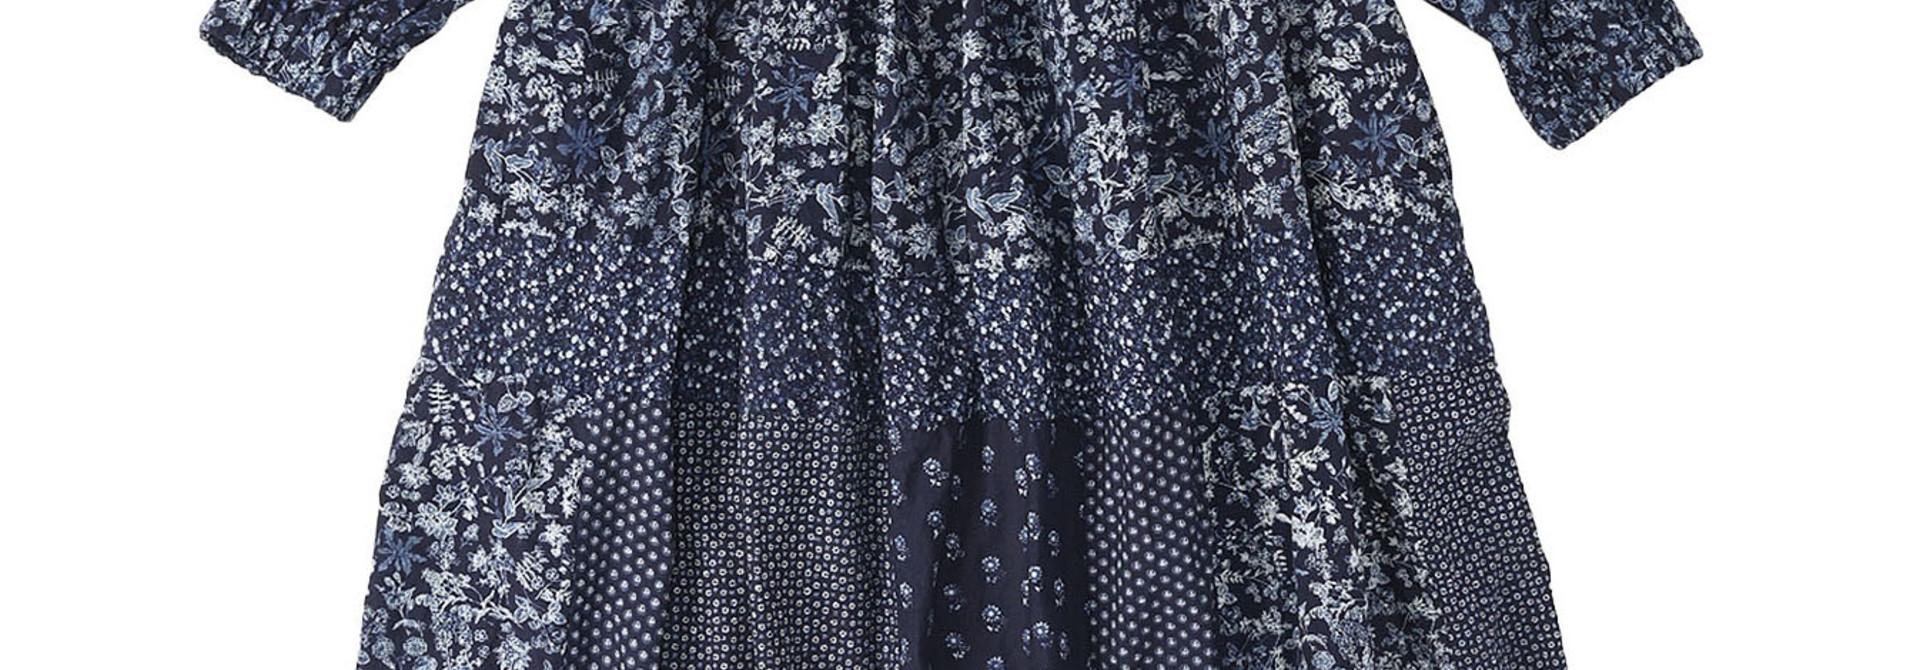 Indigo Tappet Flower Patchwork Dress